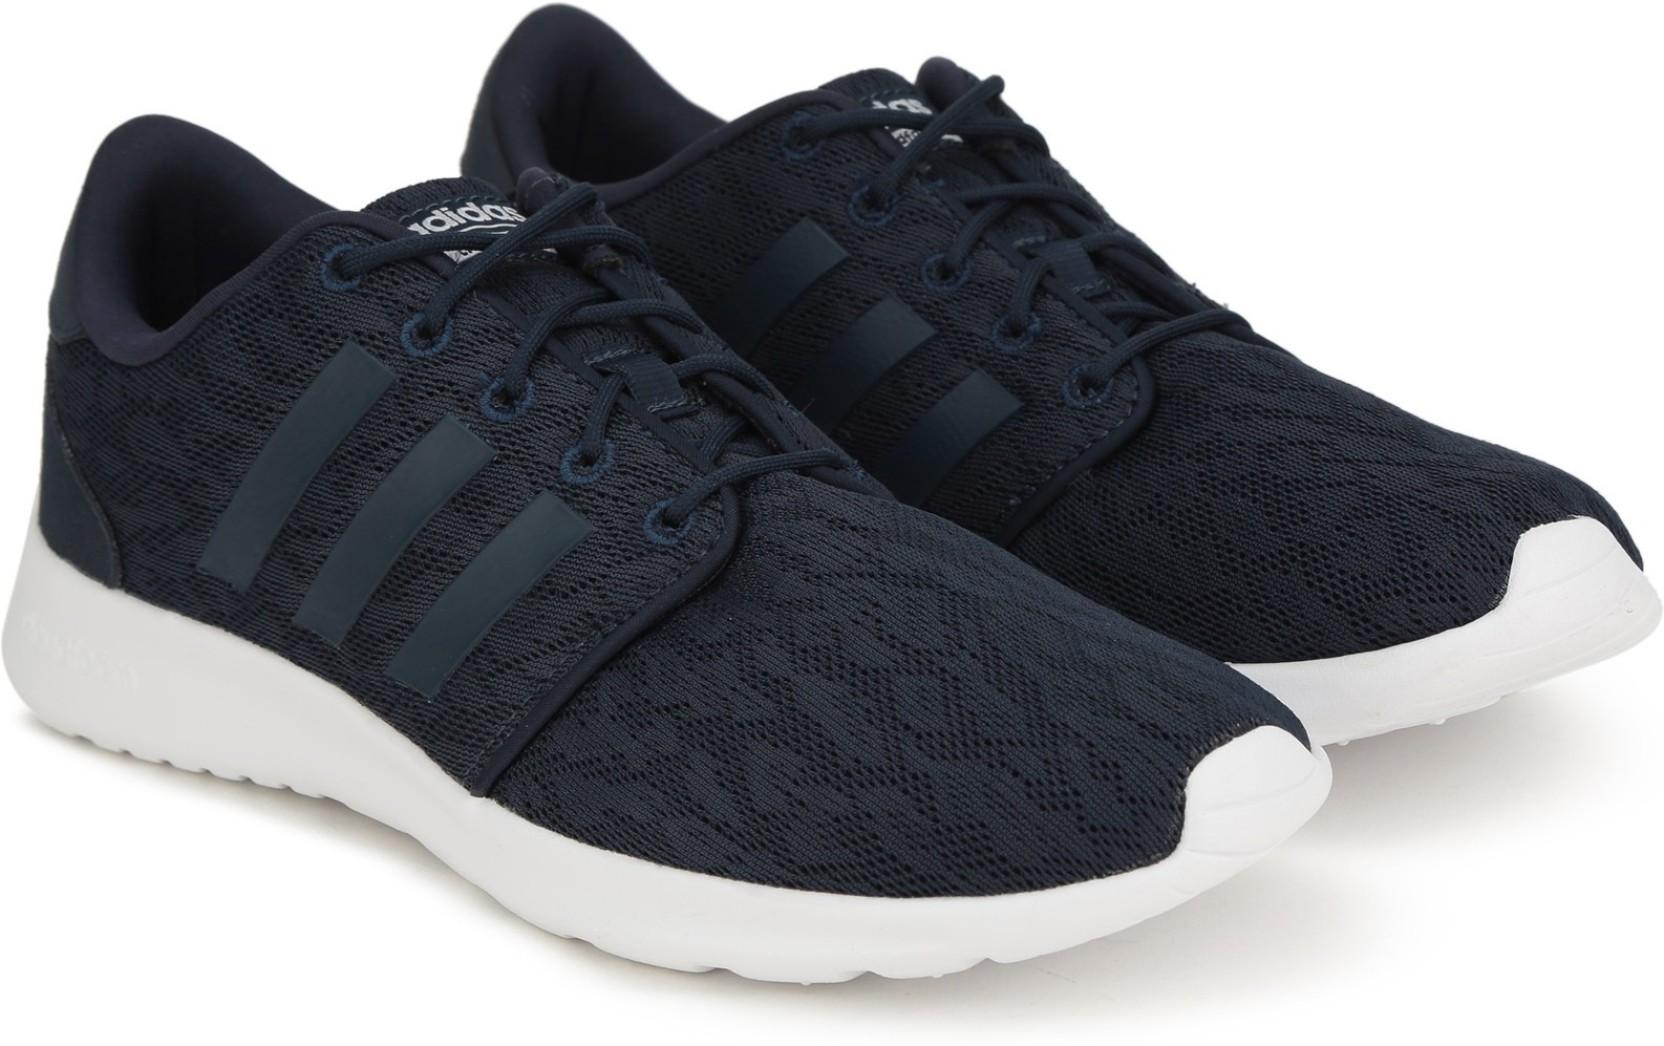 Qt For Adidas Conavyconavy Cf Racer Shoes Women Neo Buy W Running N8nv0wPyOm